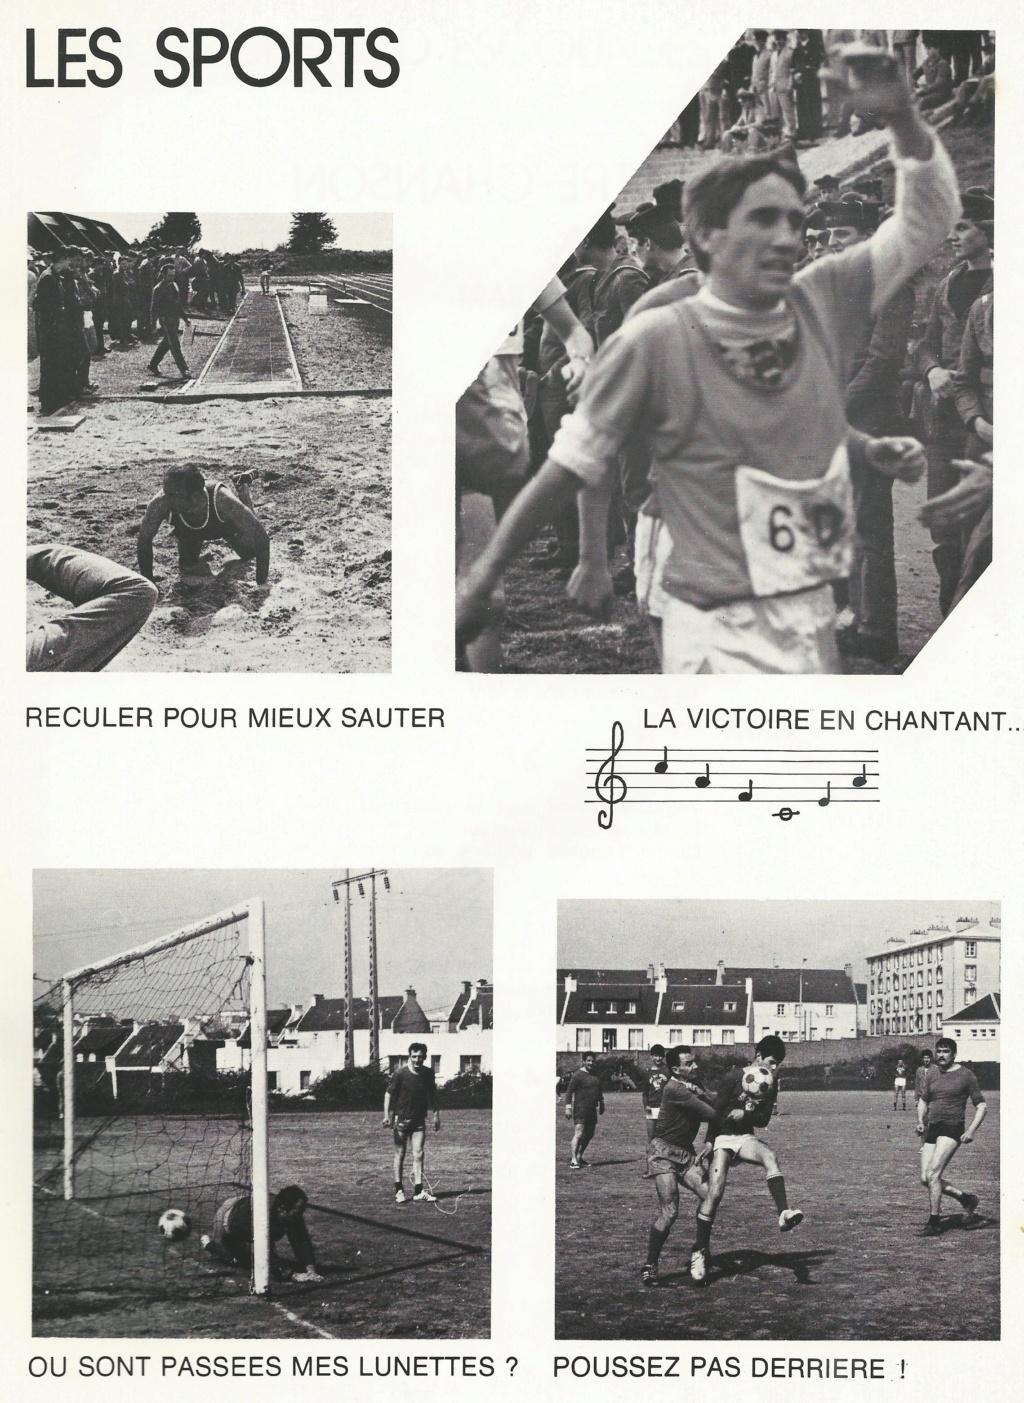 [ École des Mousses ] École des mousses 76/77 Mousse26